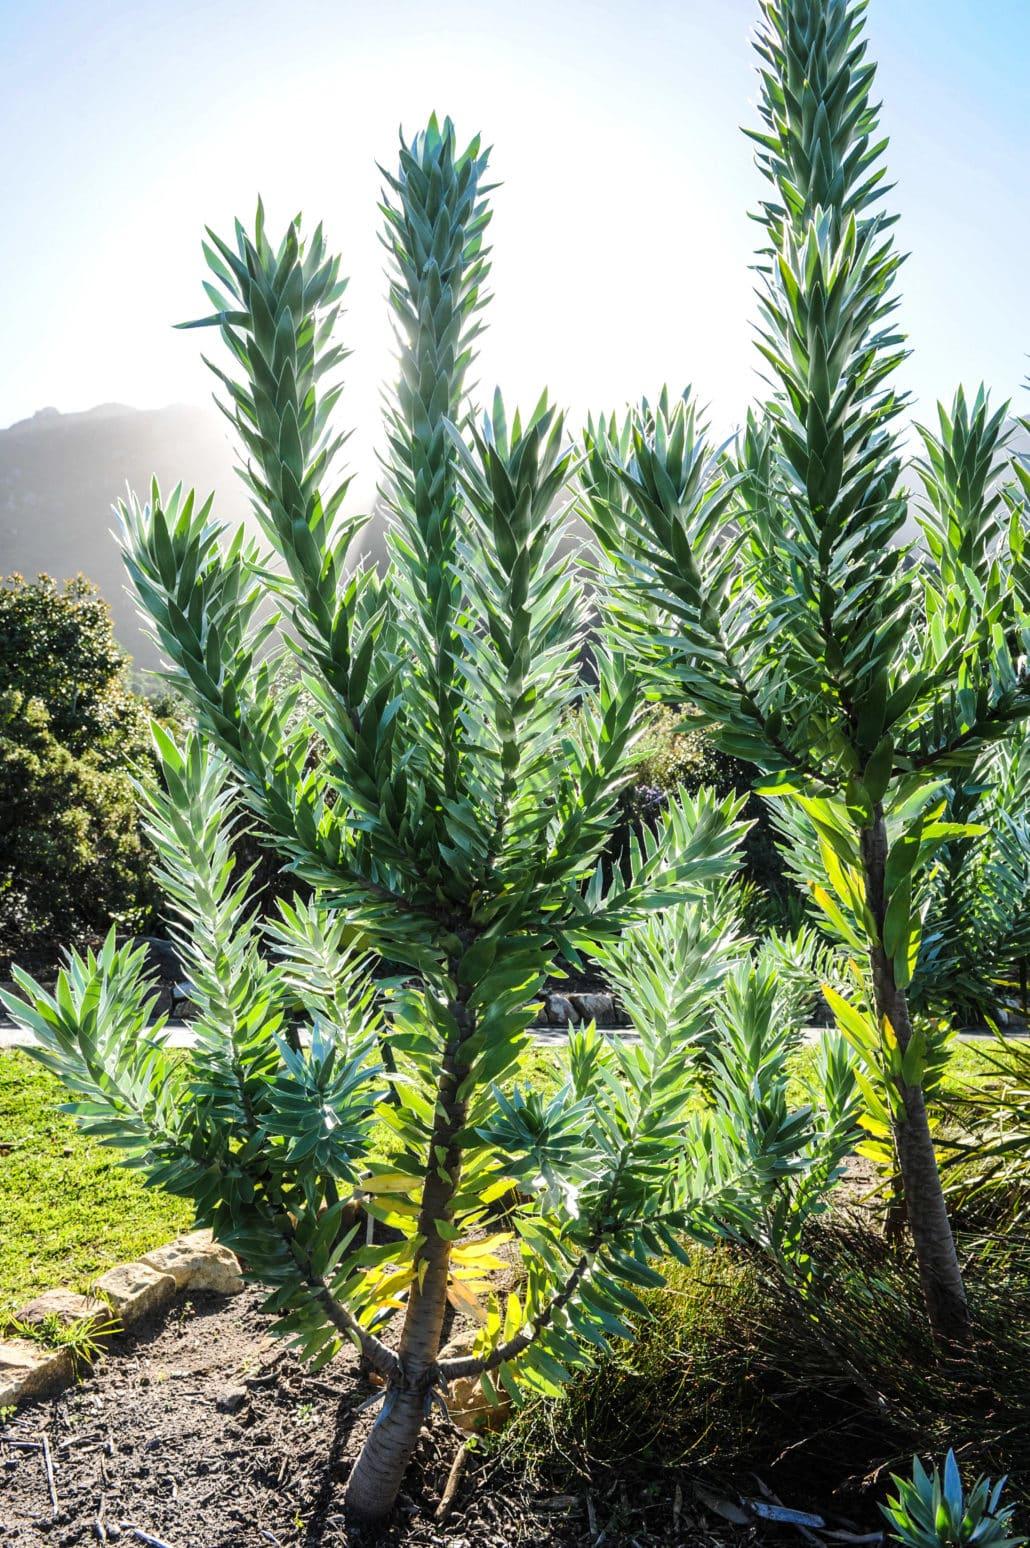 A large Silver Tree in Kirstenbosch National Botanical Garden